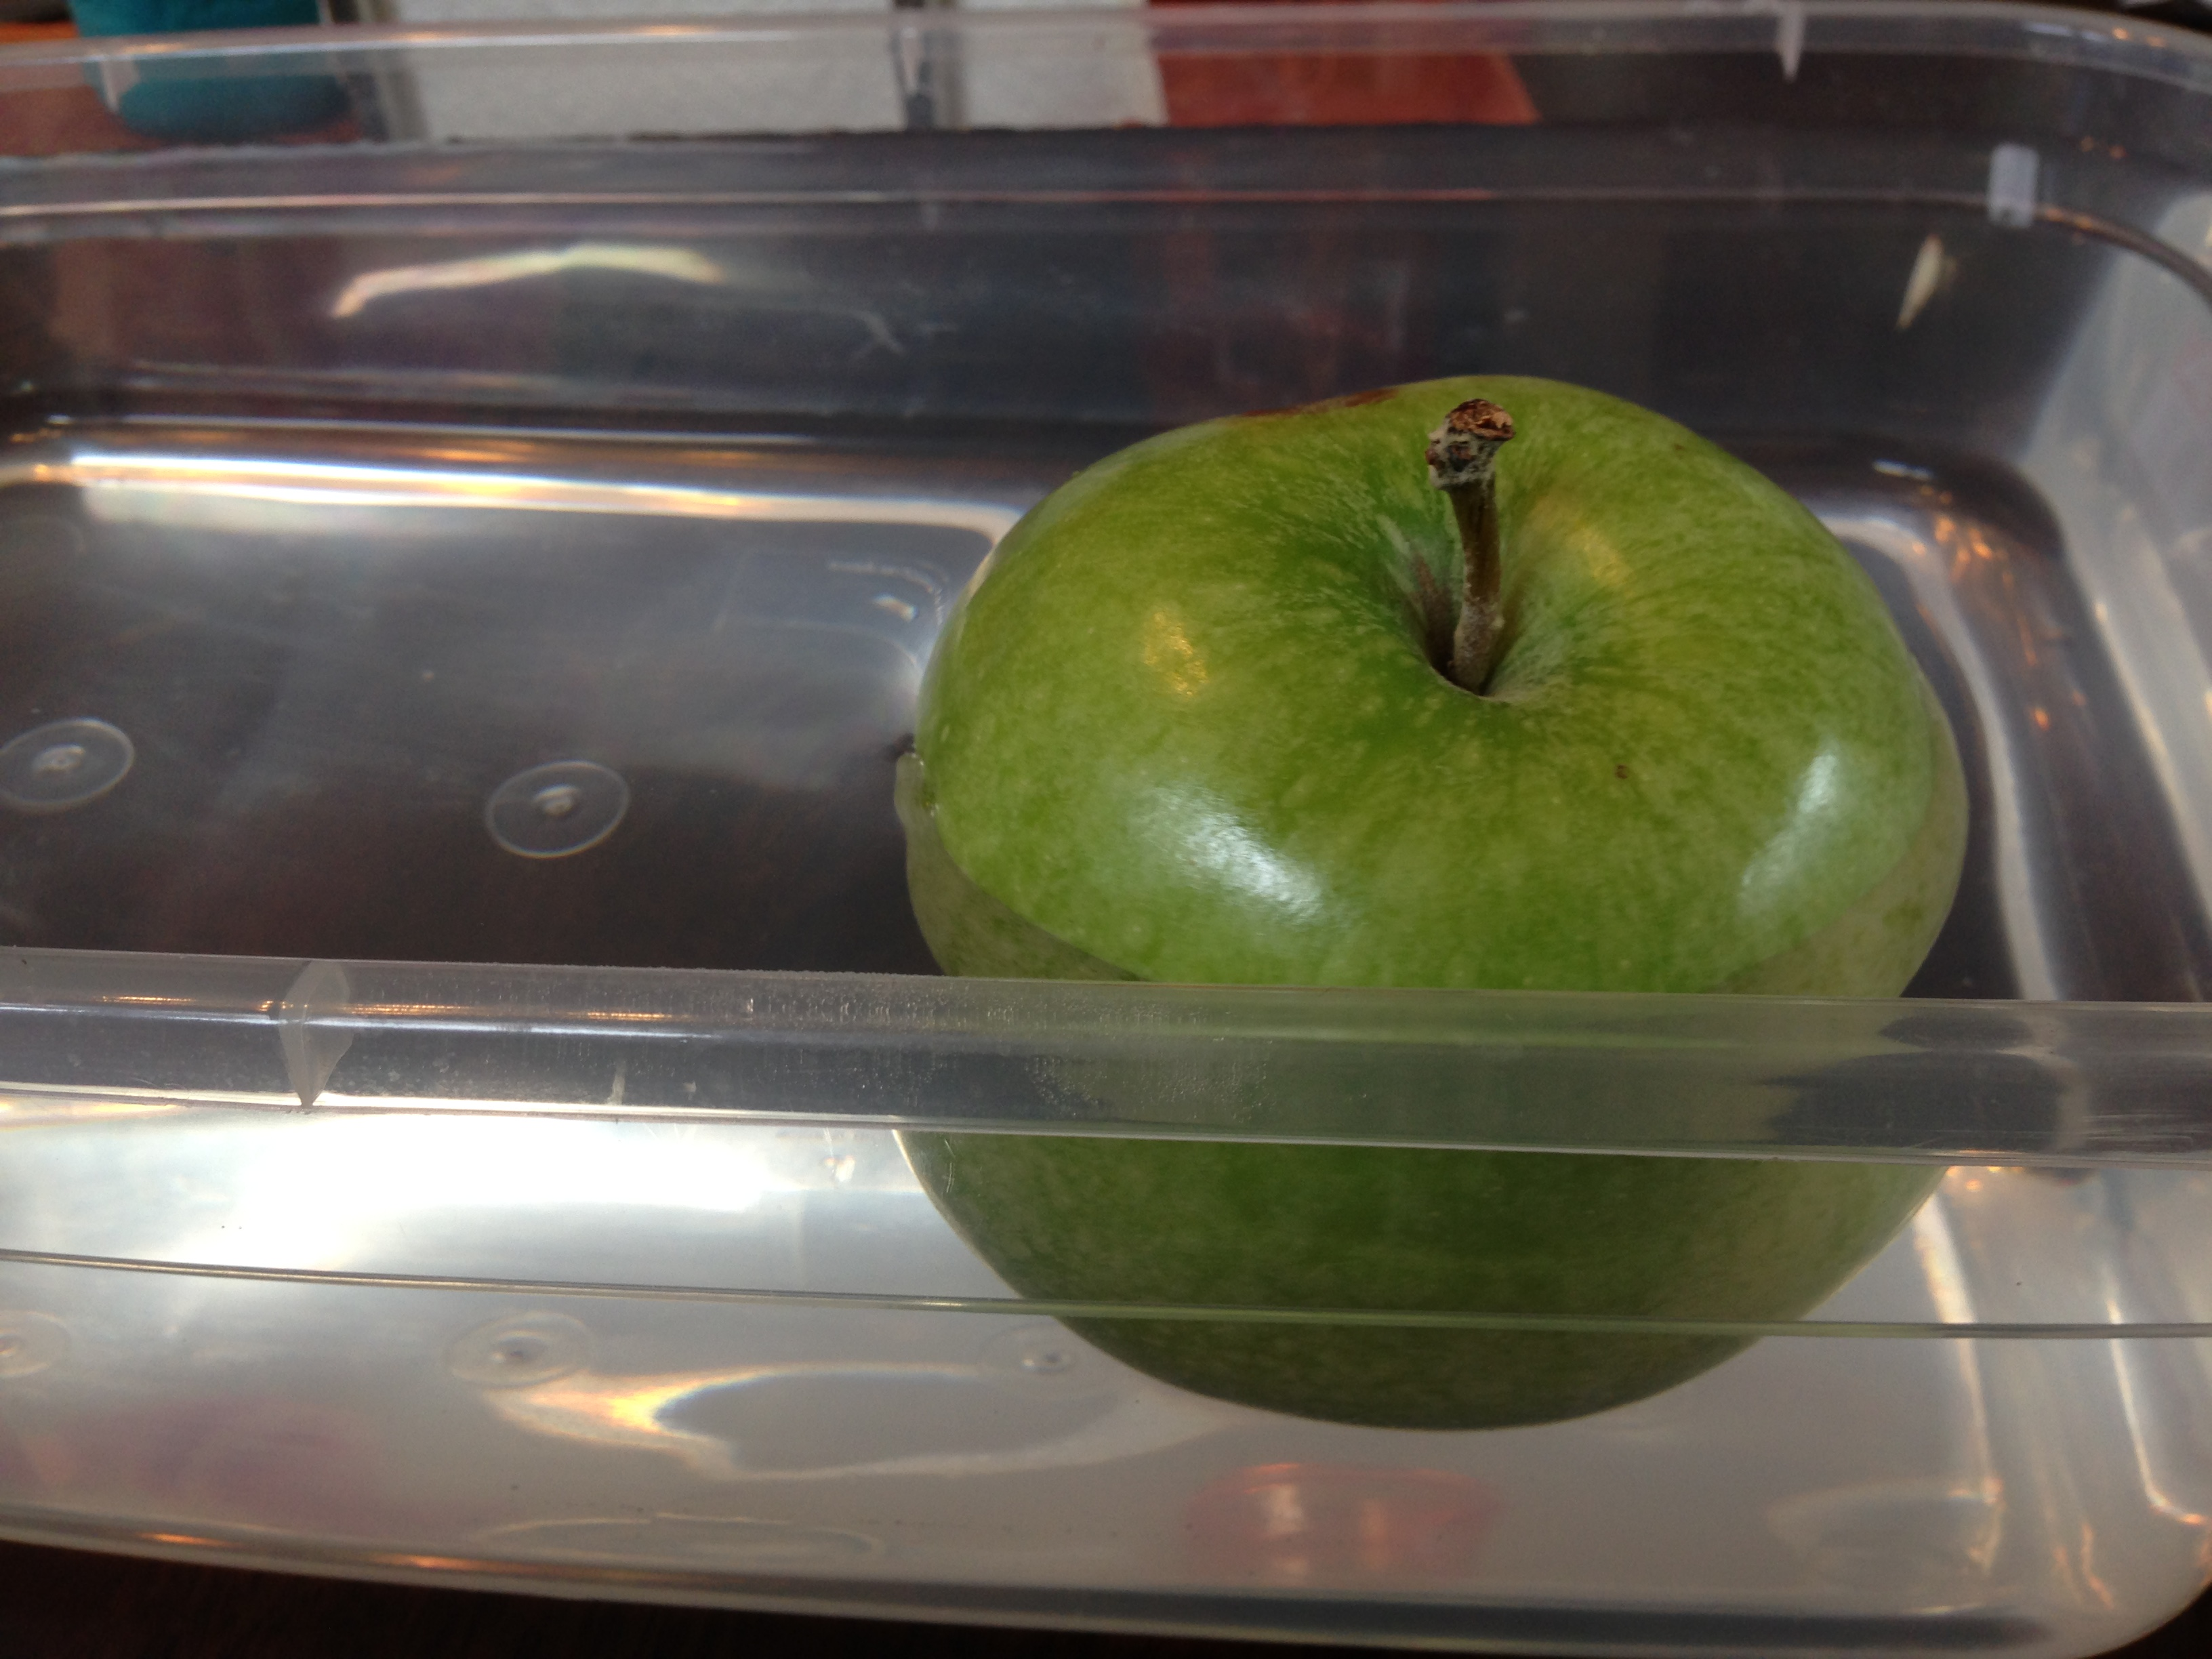 Apple Float Or Sink